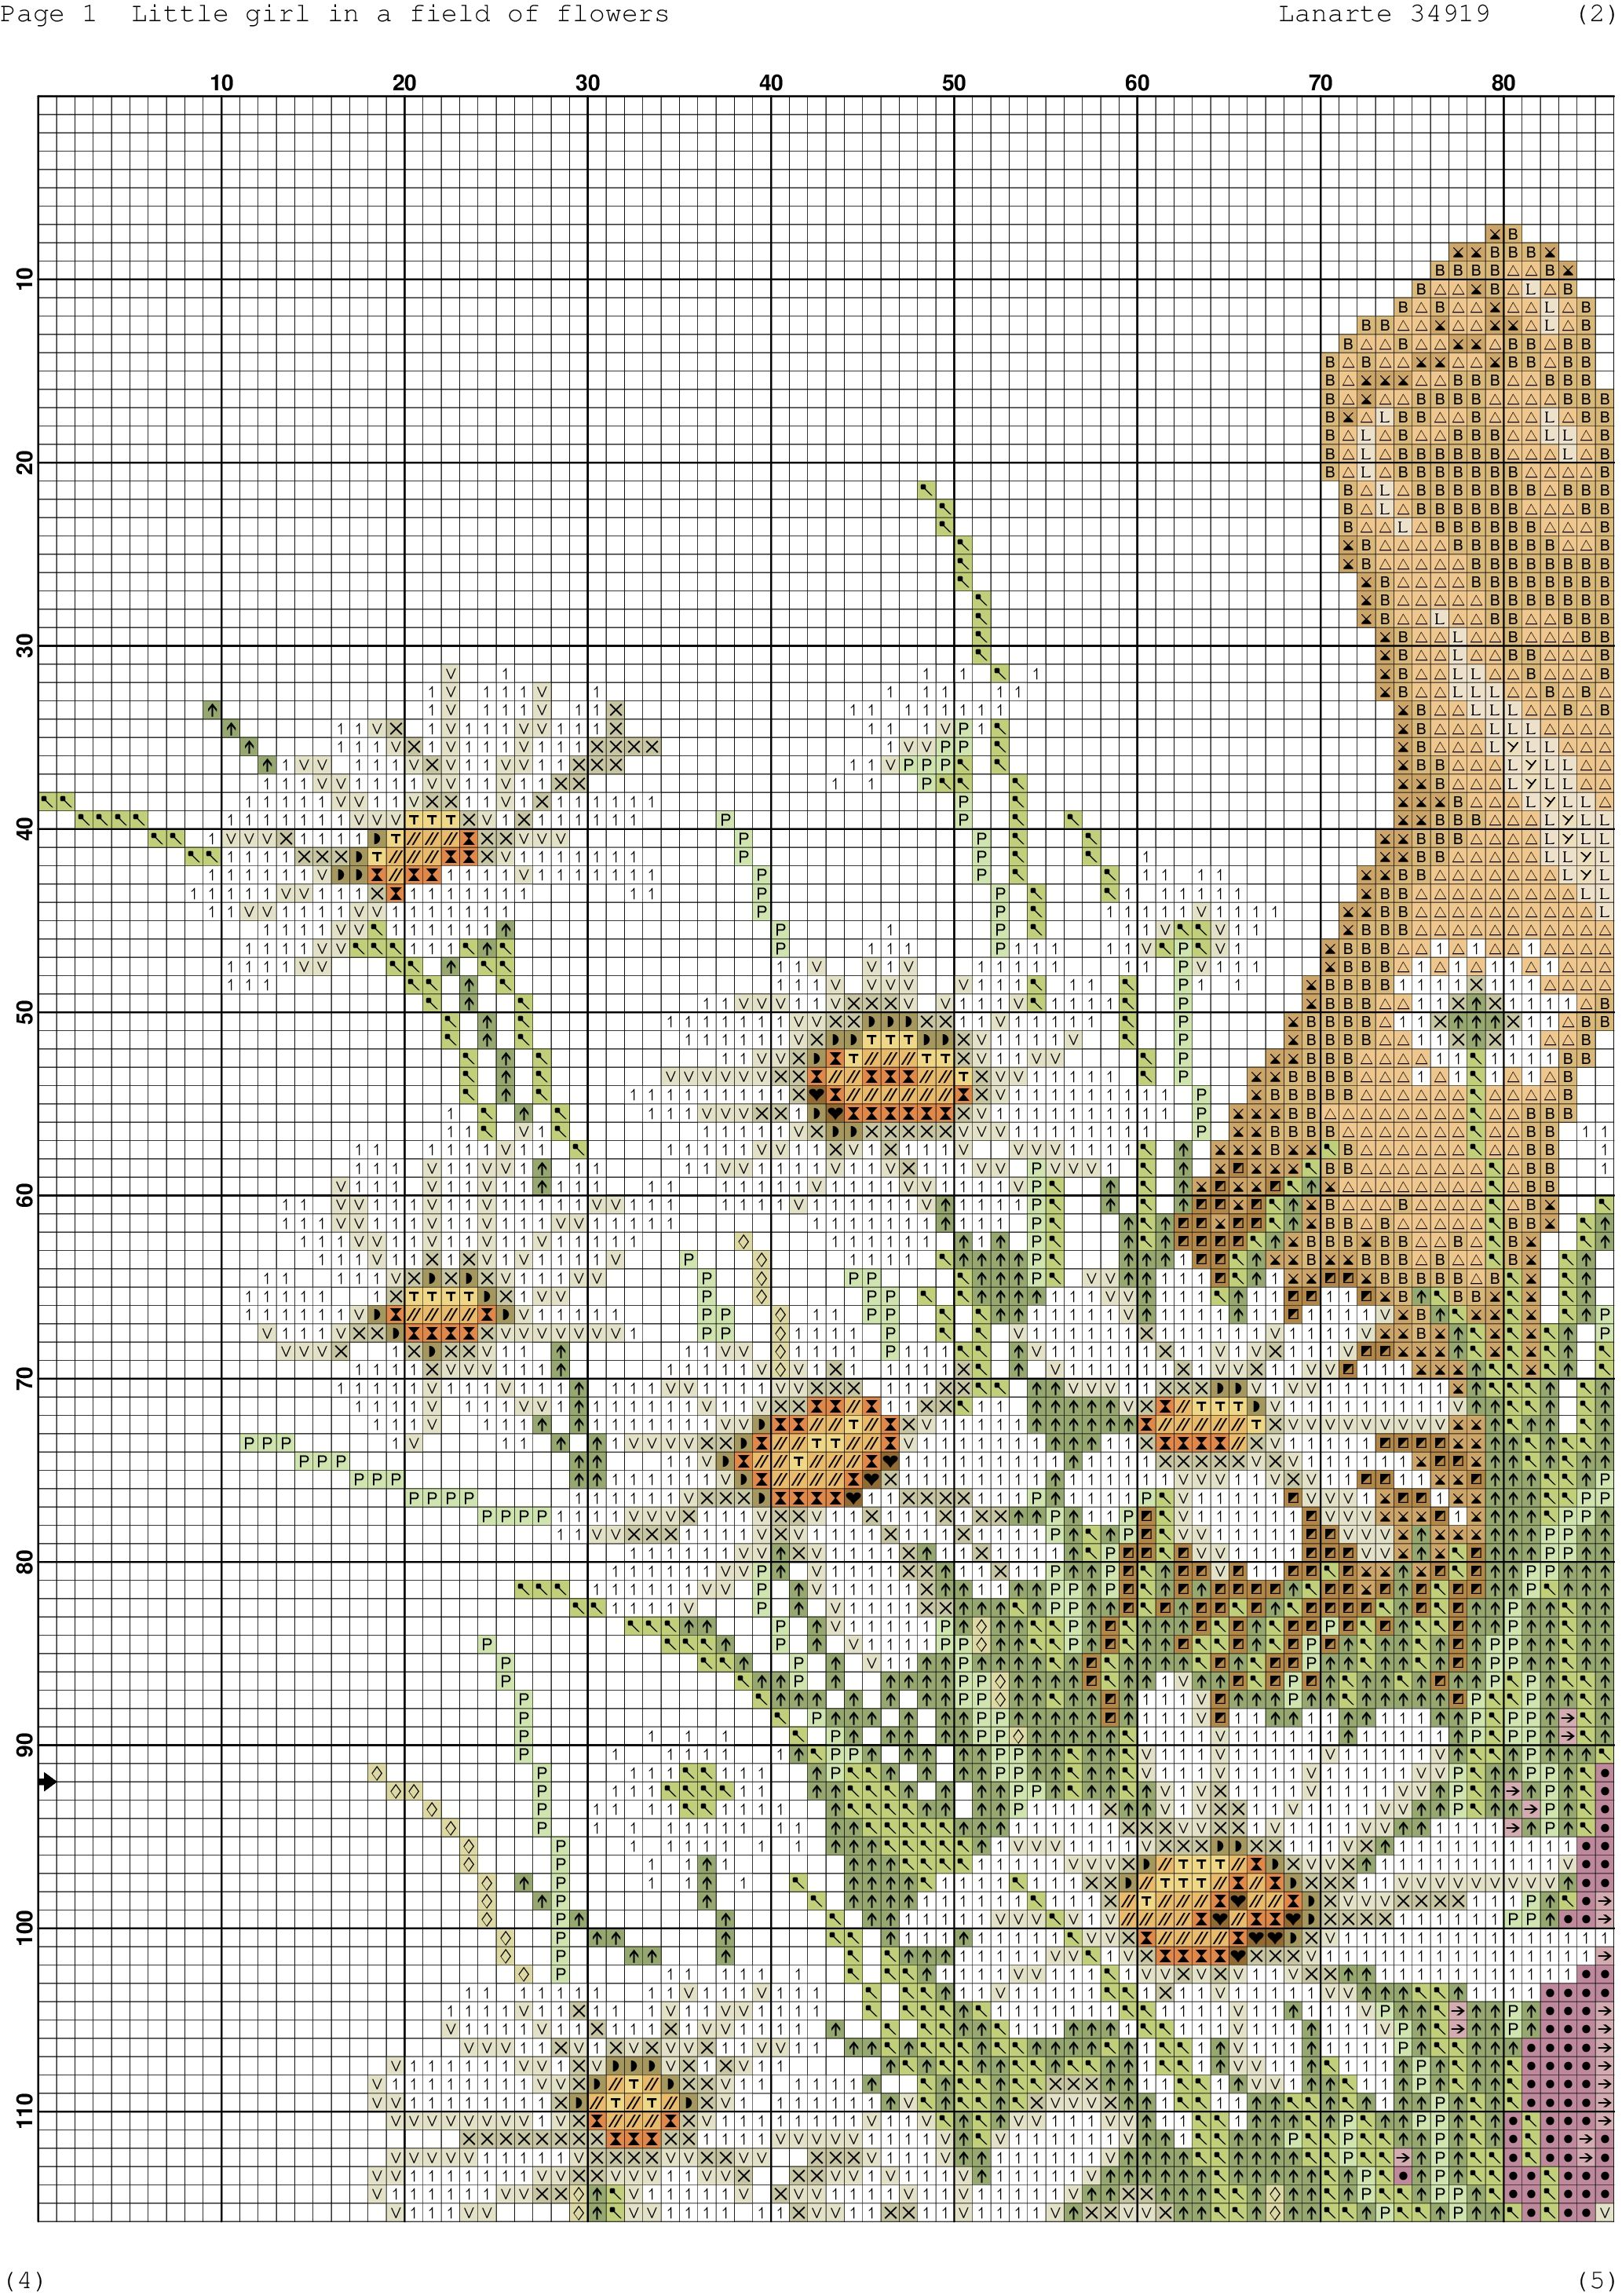 nena en un camp de flors-02